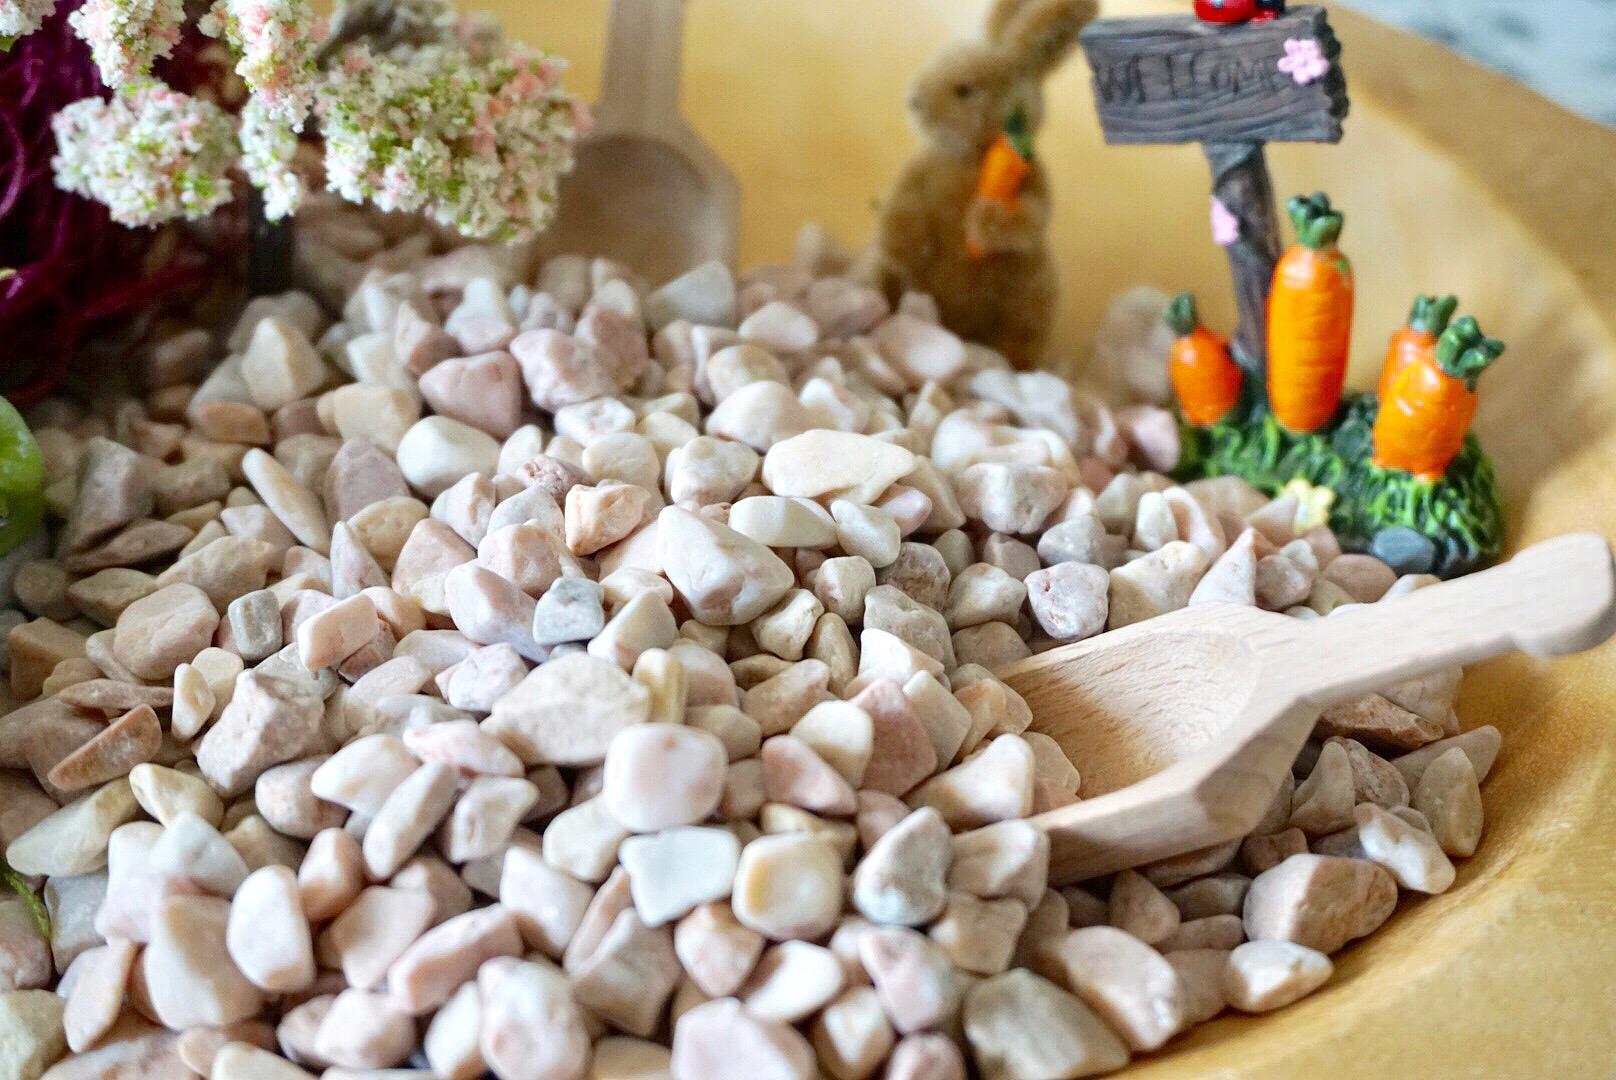 Pink rock from Michaels makes a great base for DIY mason jar fairy garden terrariums.